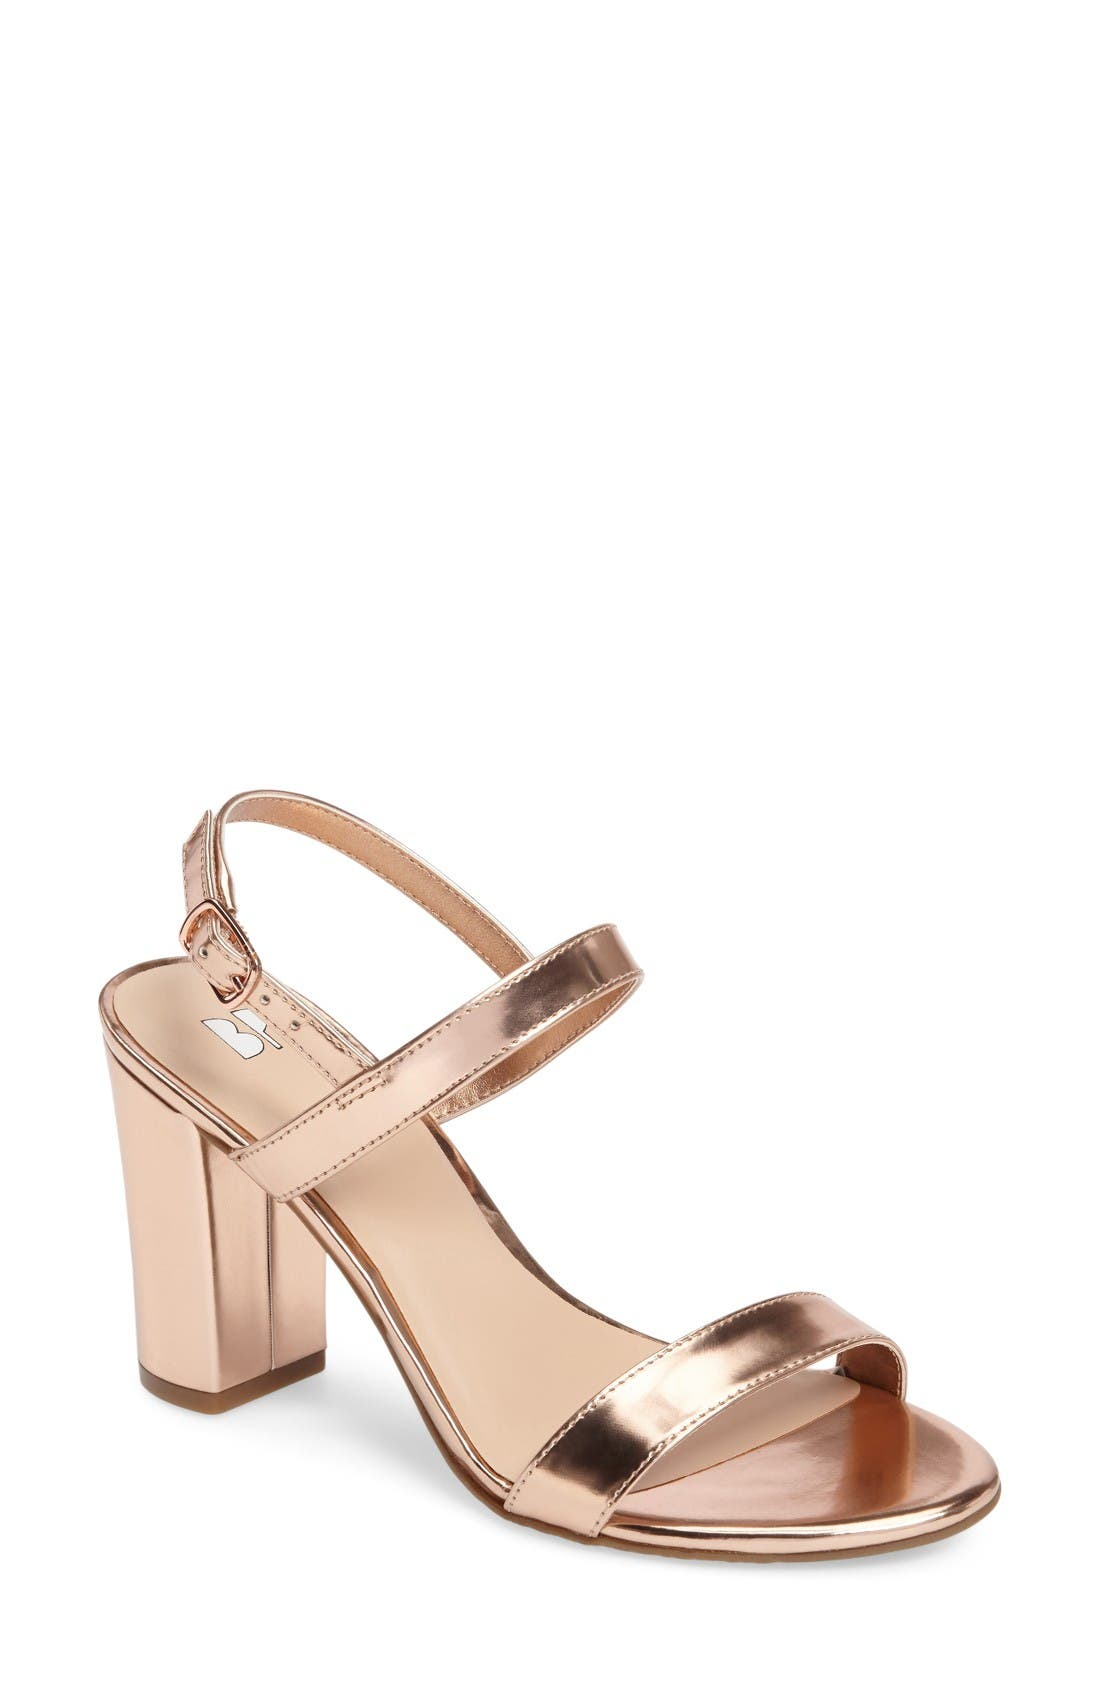 Lula Block Heel Slingback Sandal (Women). Previous. ROSE GOLD ...